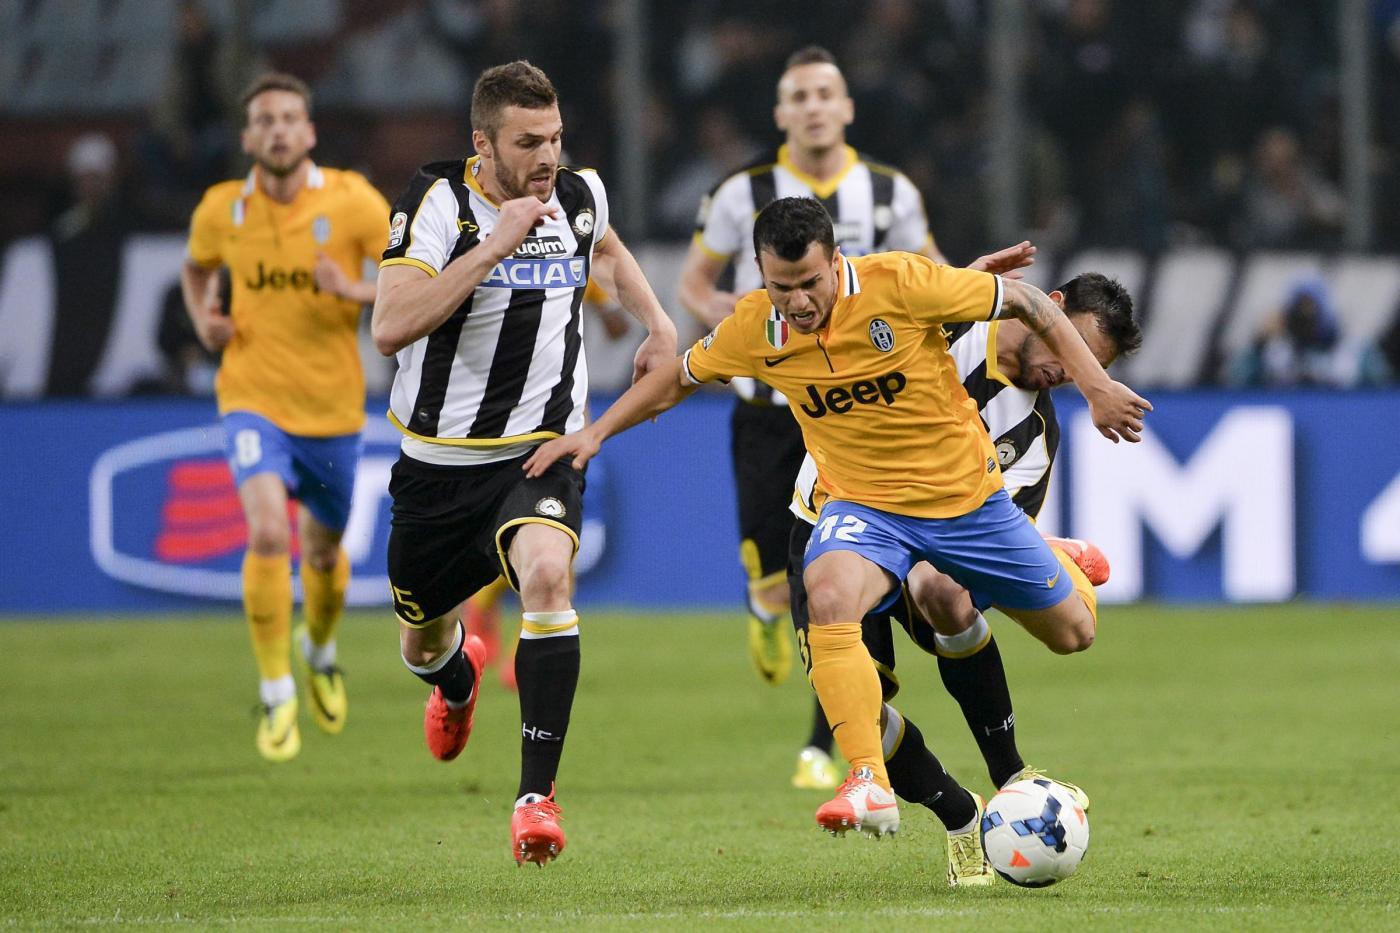 Giovinco Juve Udinese 150x150